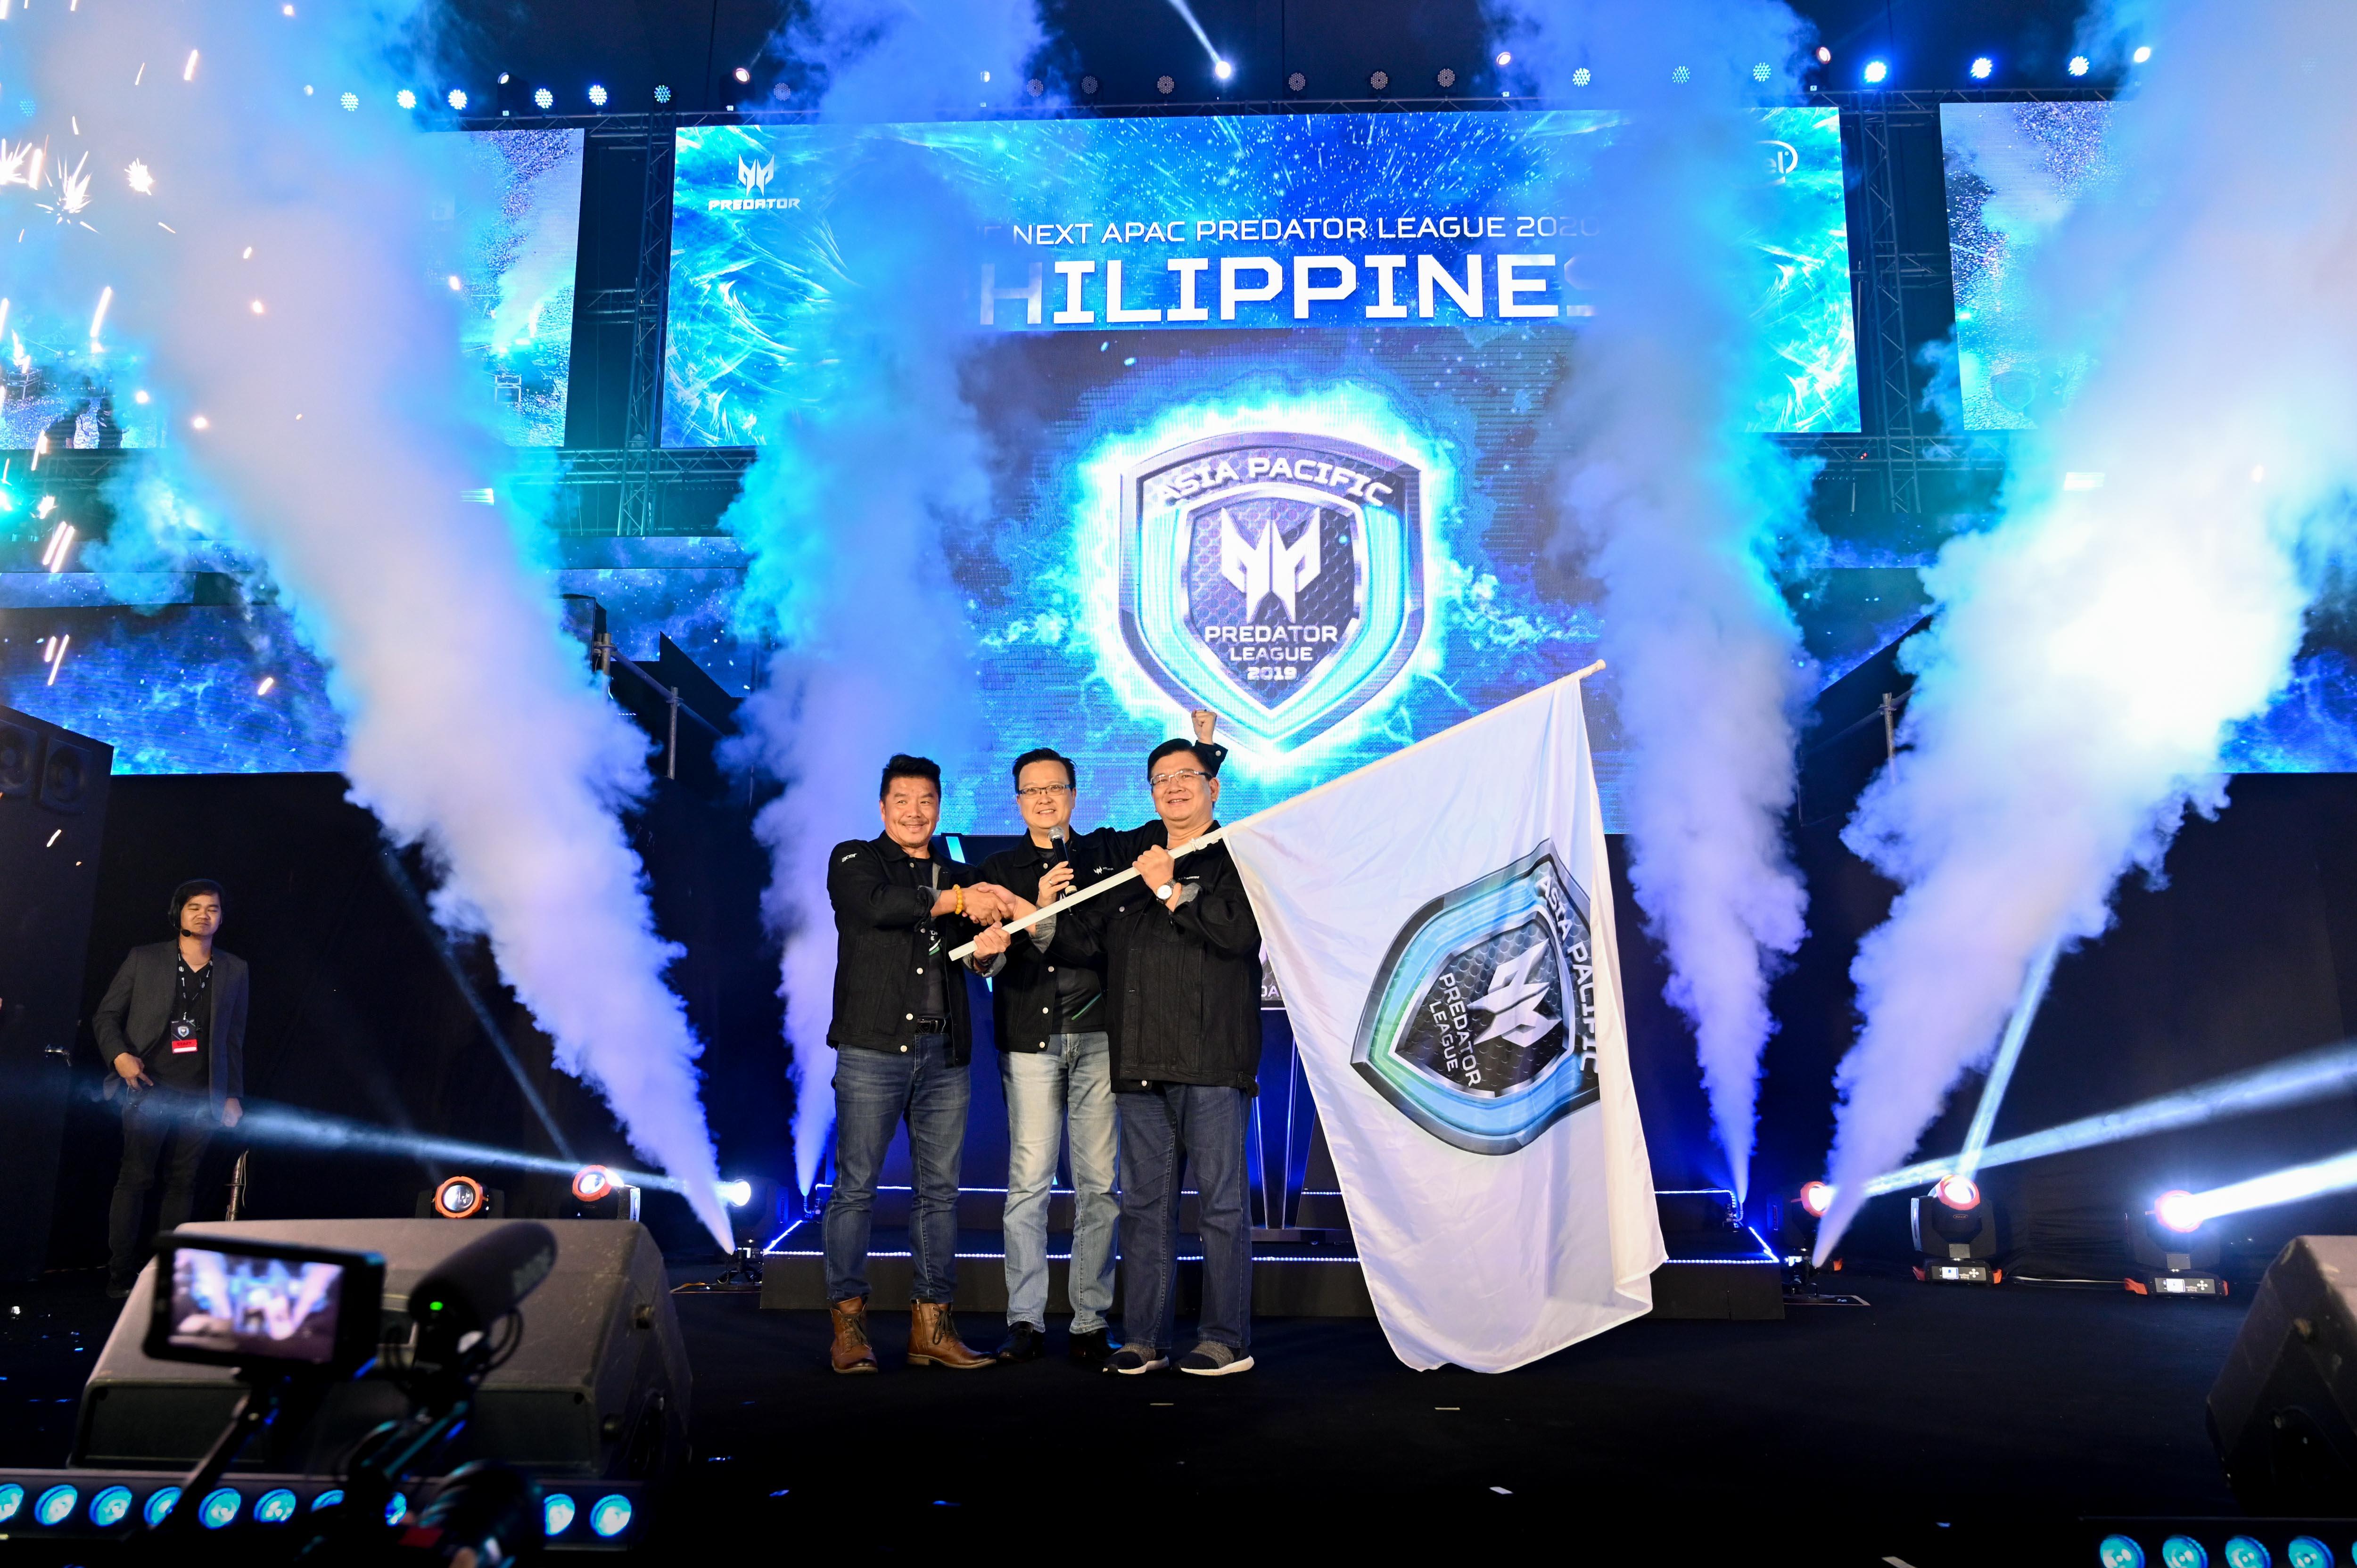 20 dsc 3690 17 02 19 บรรยากาศงาน Asia Pacific Predator League 2019 สุดยอดขุนพลทีมอีสปอร์ตเข้าร่วมการแข่งขันรอบแกรนด์ไฟนอล